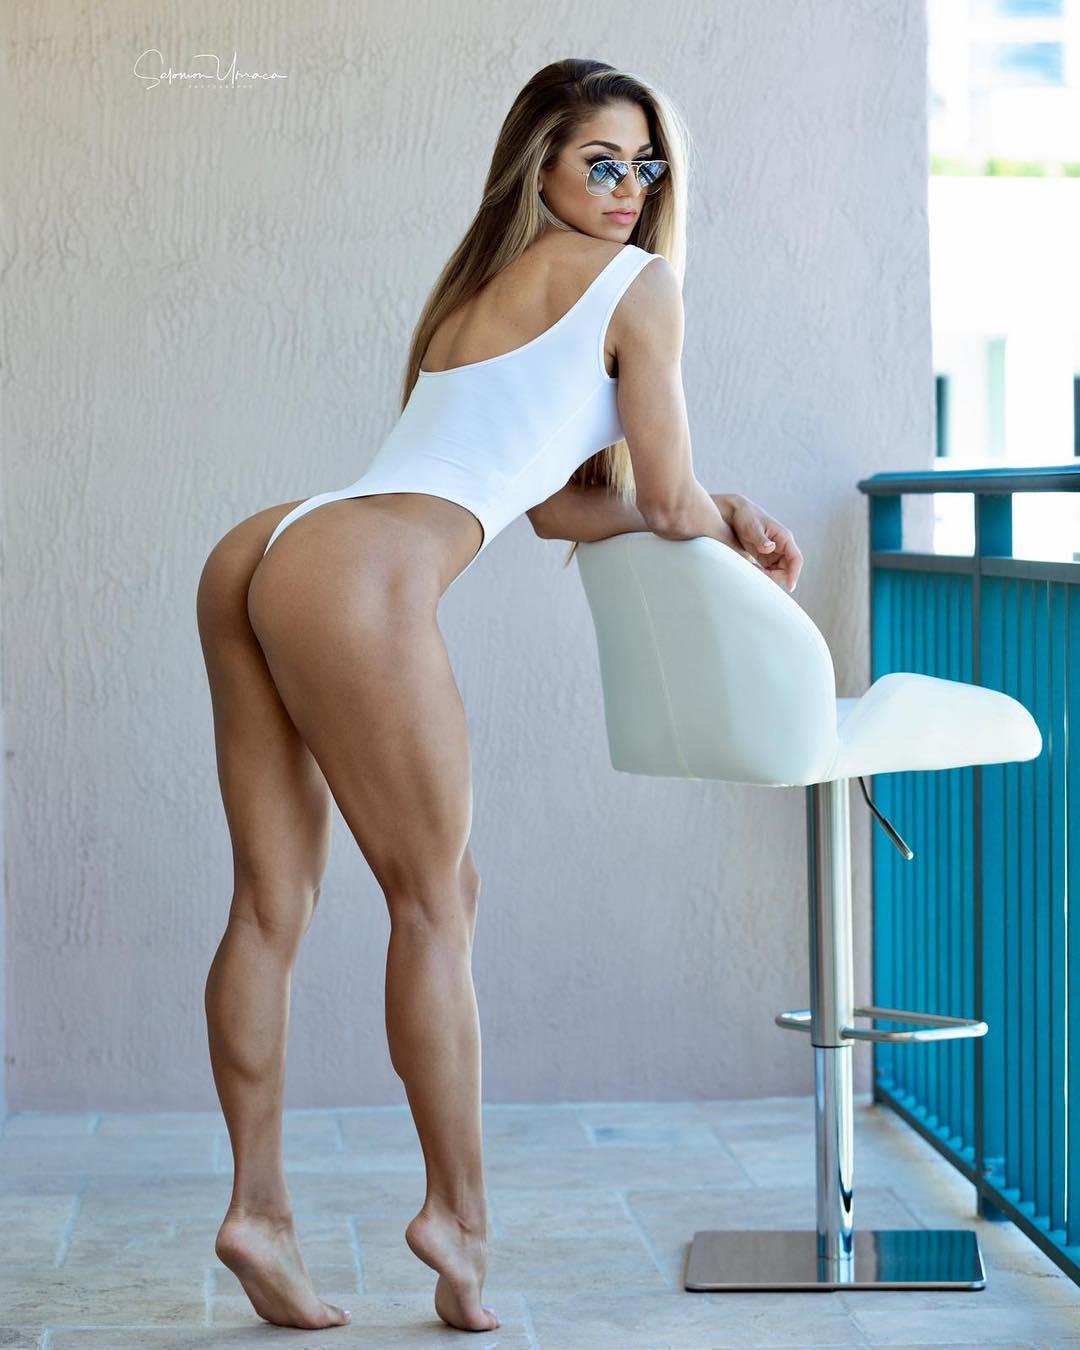 Ana Cozar Nude ana capozzoli porn pic - eporner